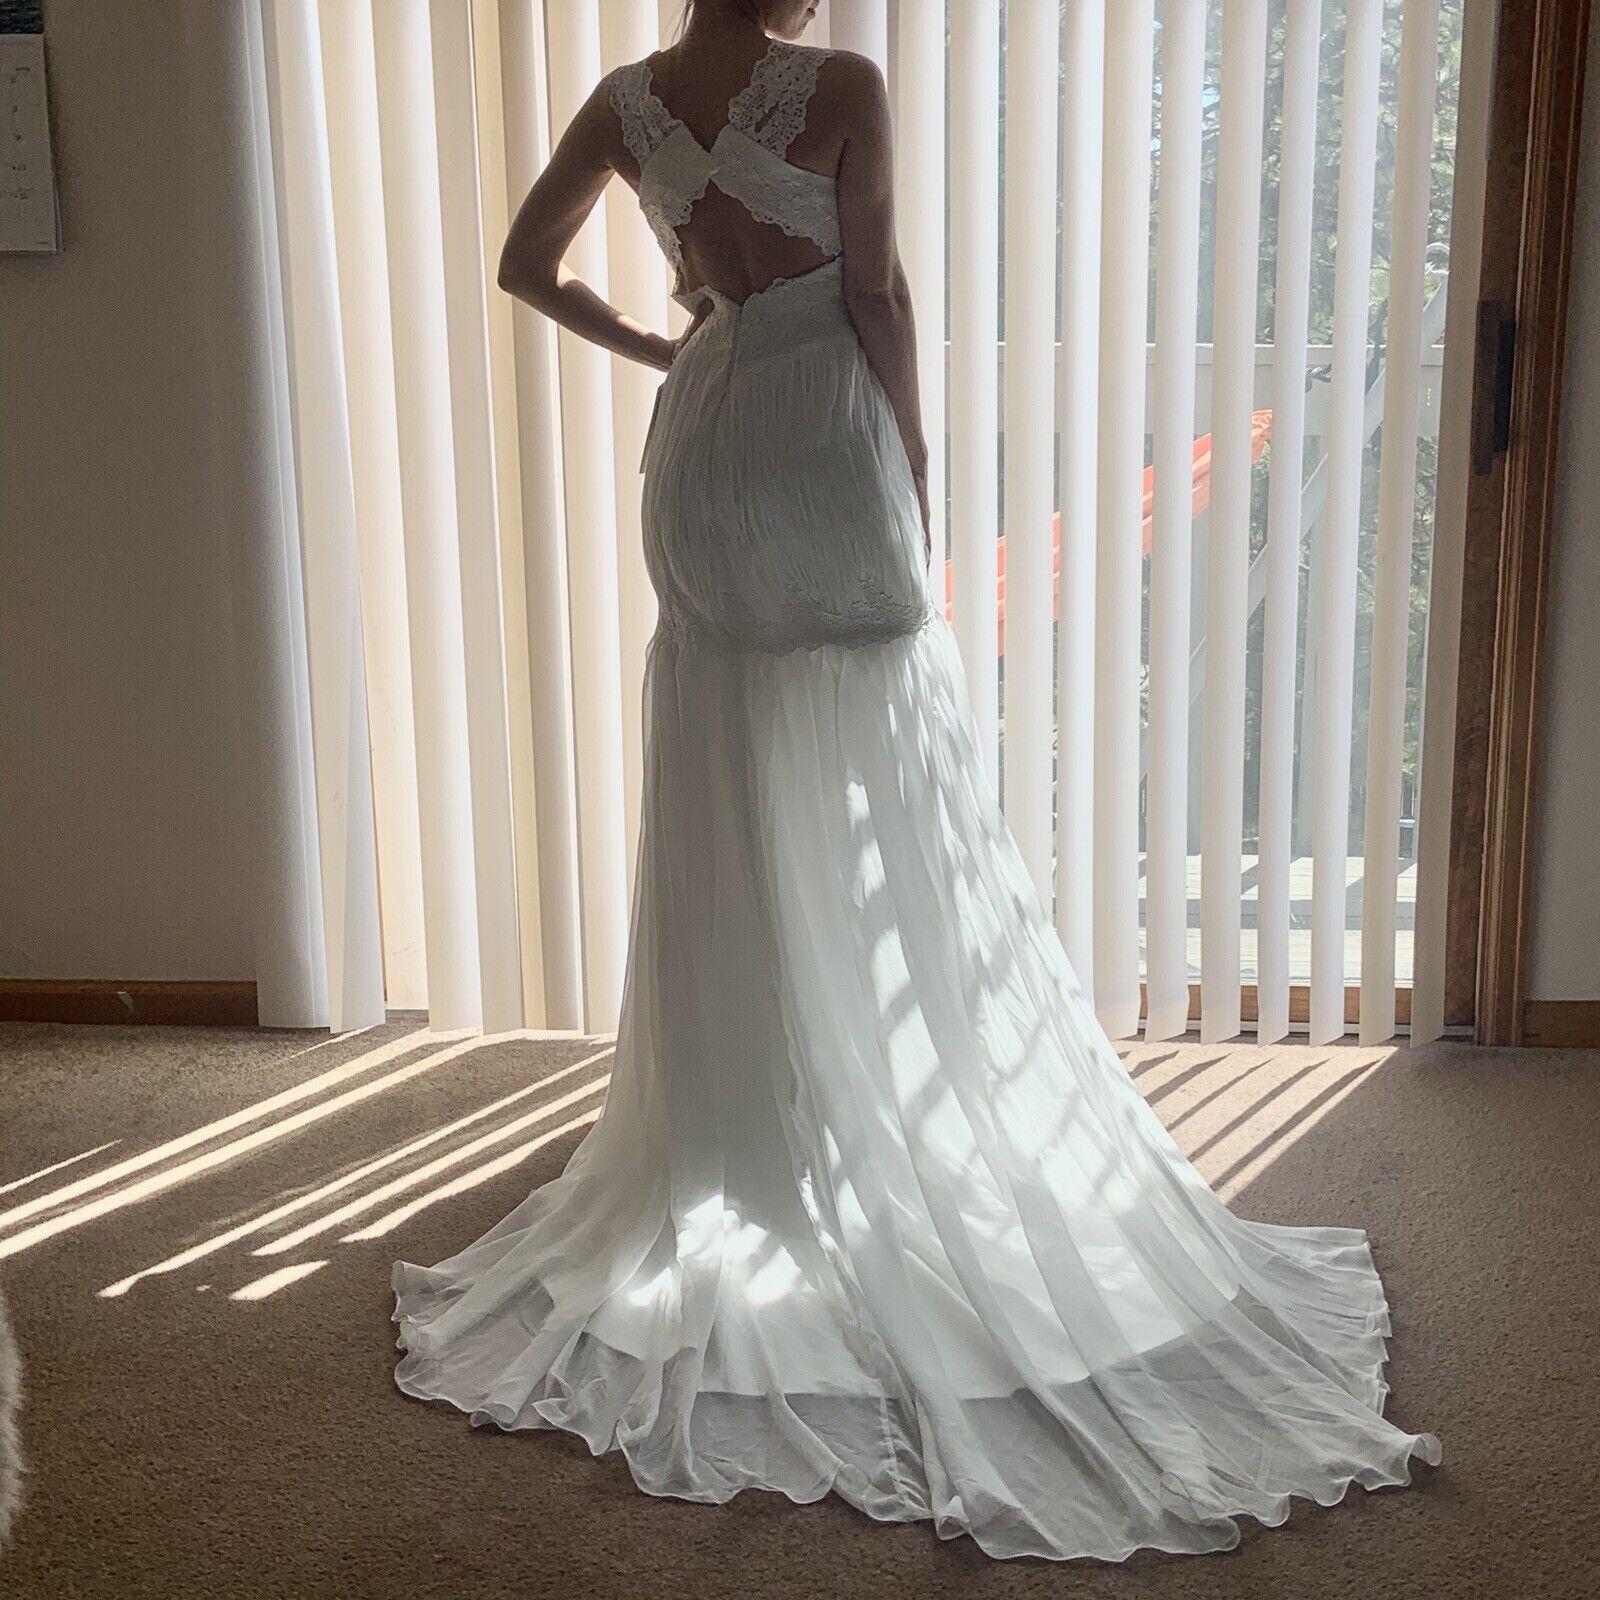 Nwt wedding gown dress by Mingda long train white